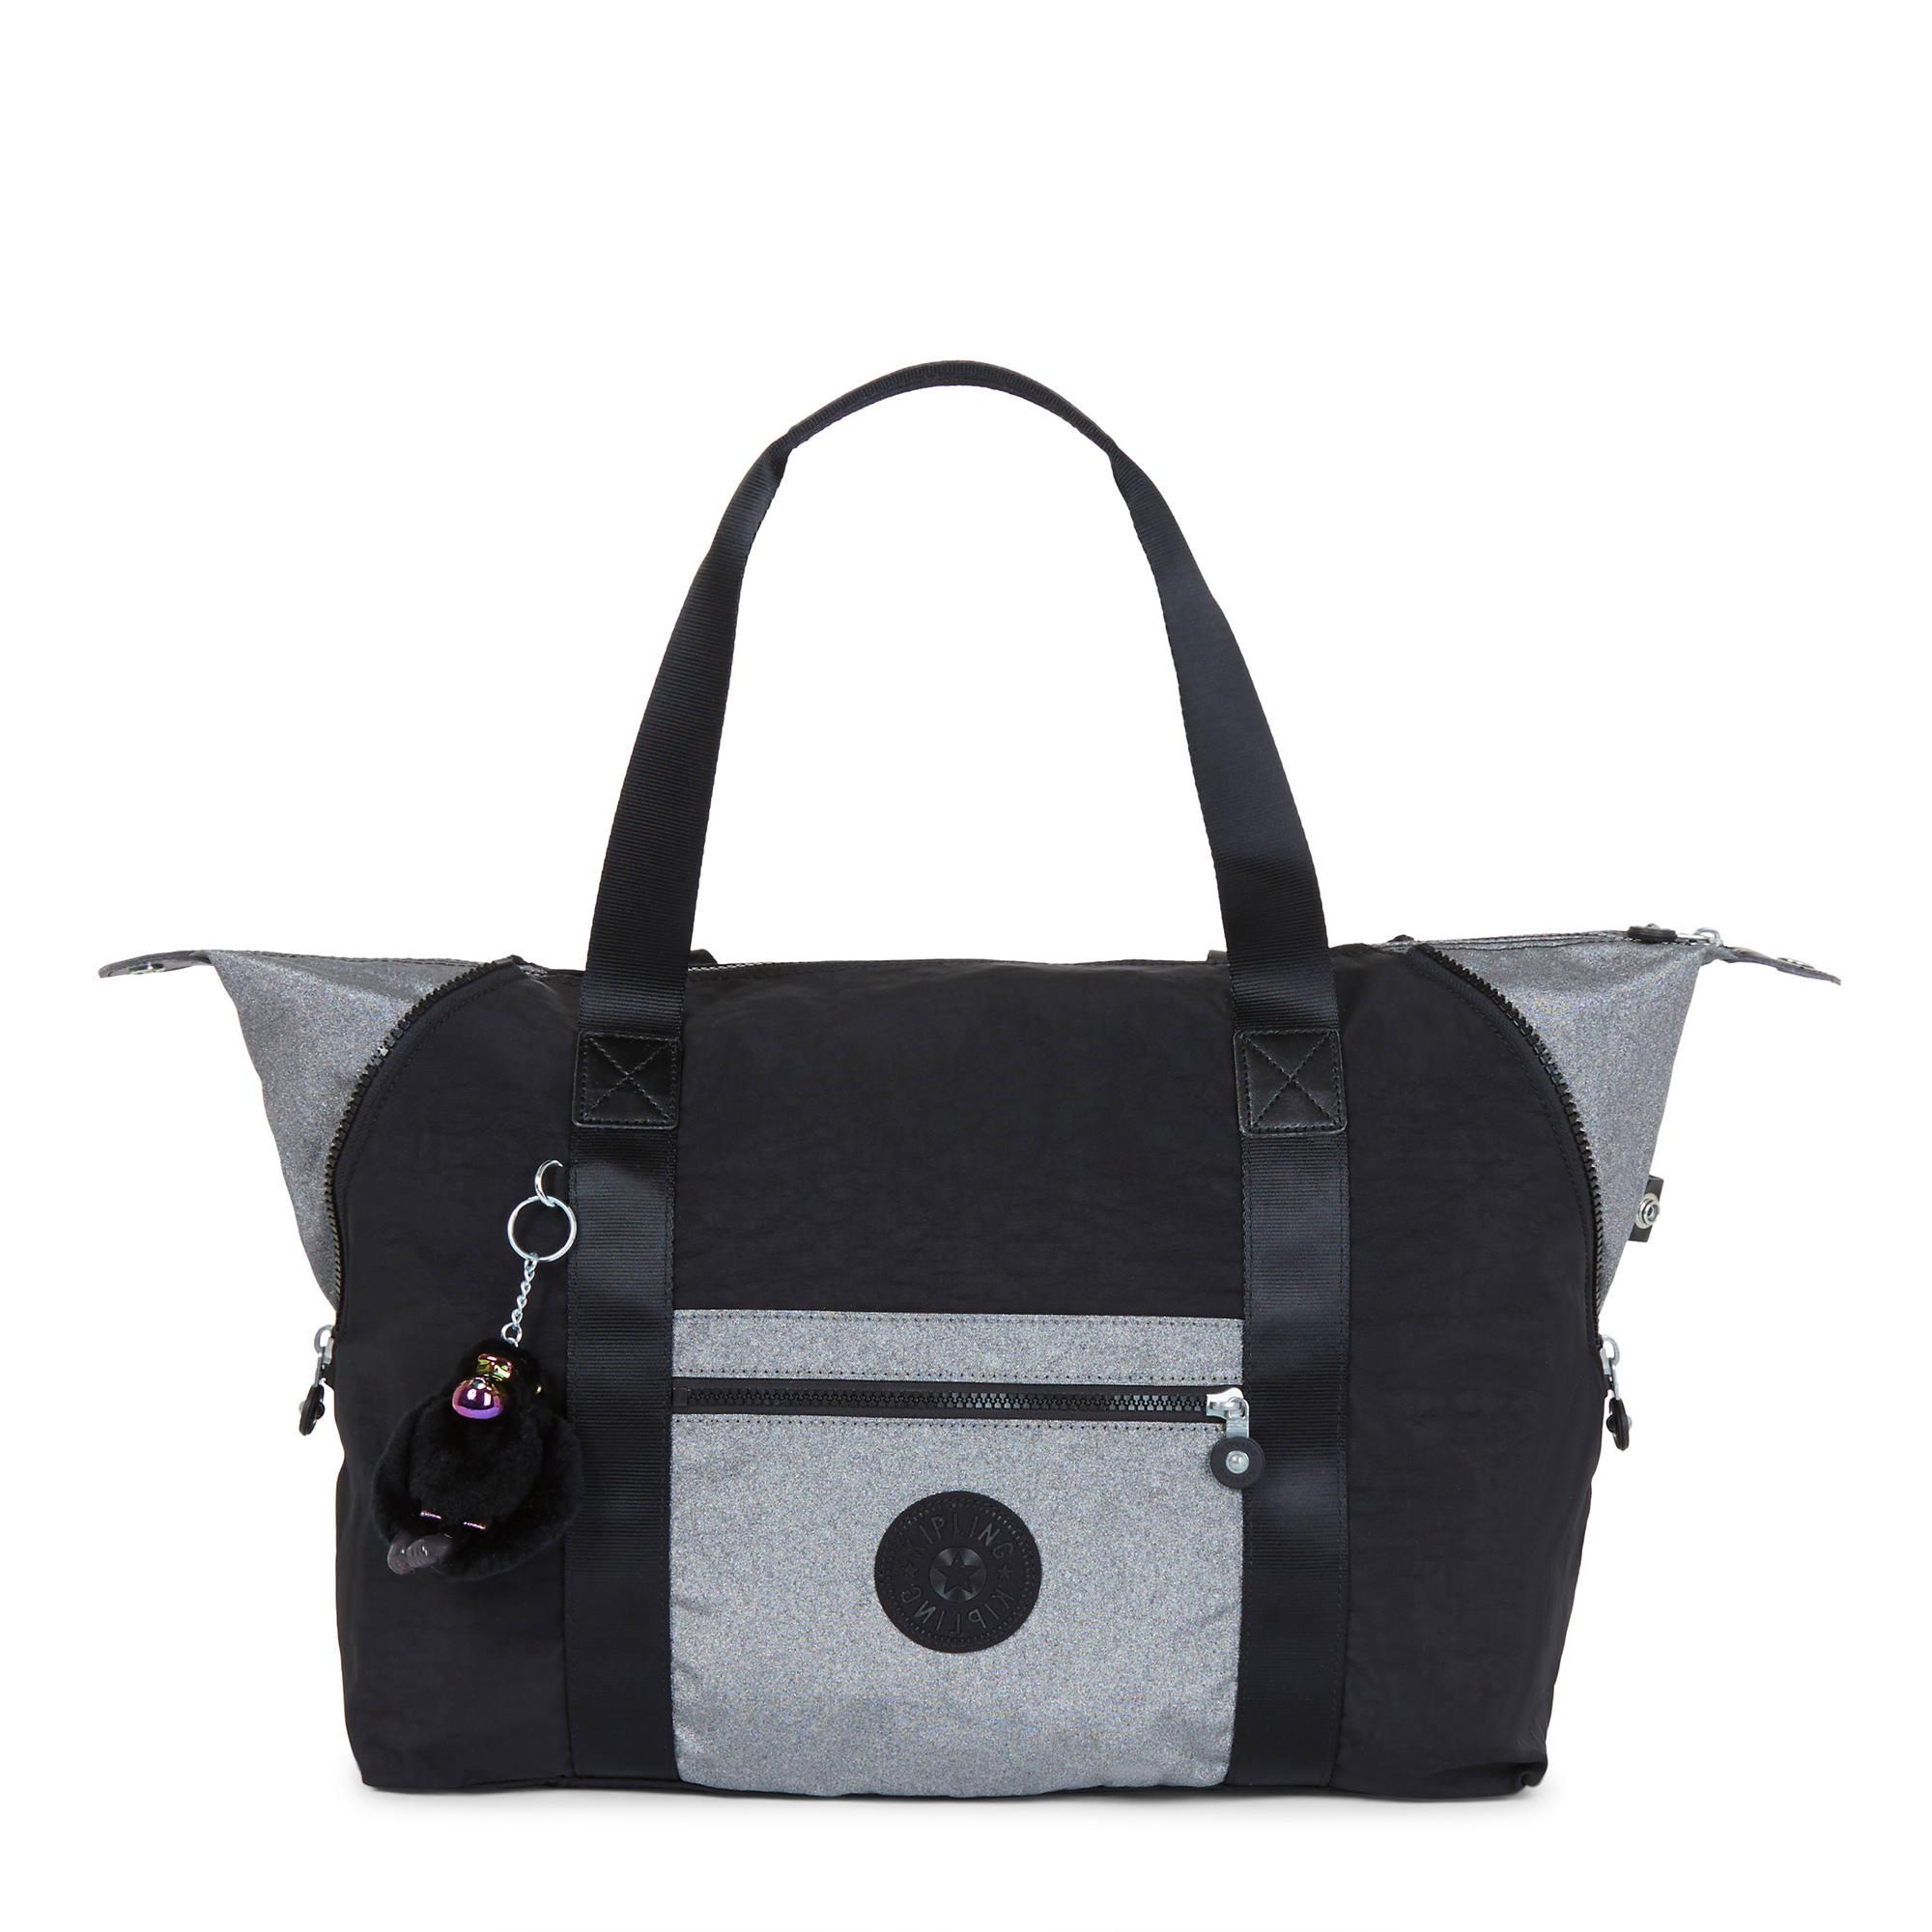 818ea5c97c45 Art Medium Tote Bag